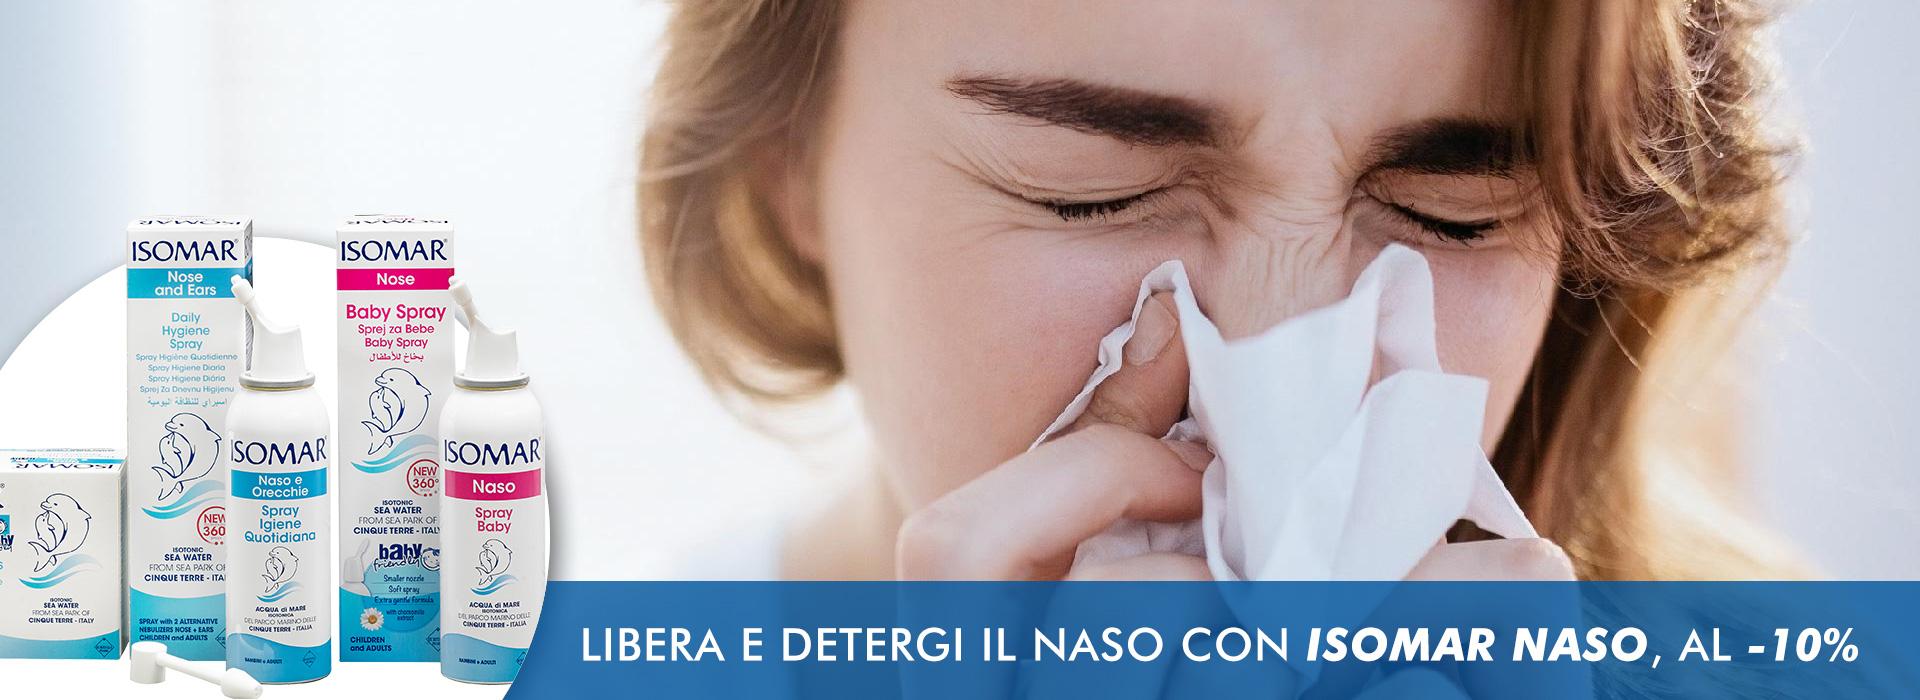 linea naso isomar -10%